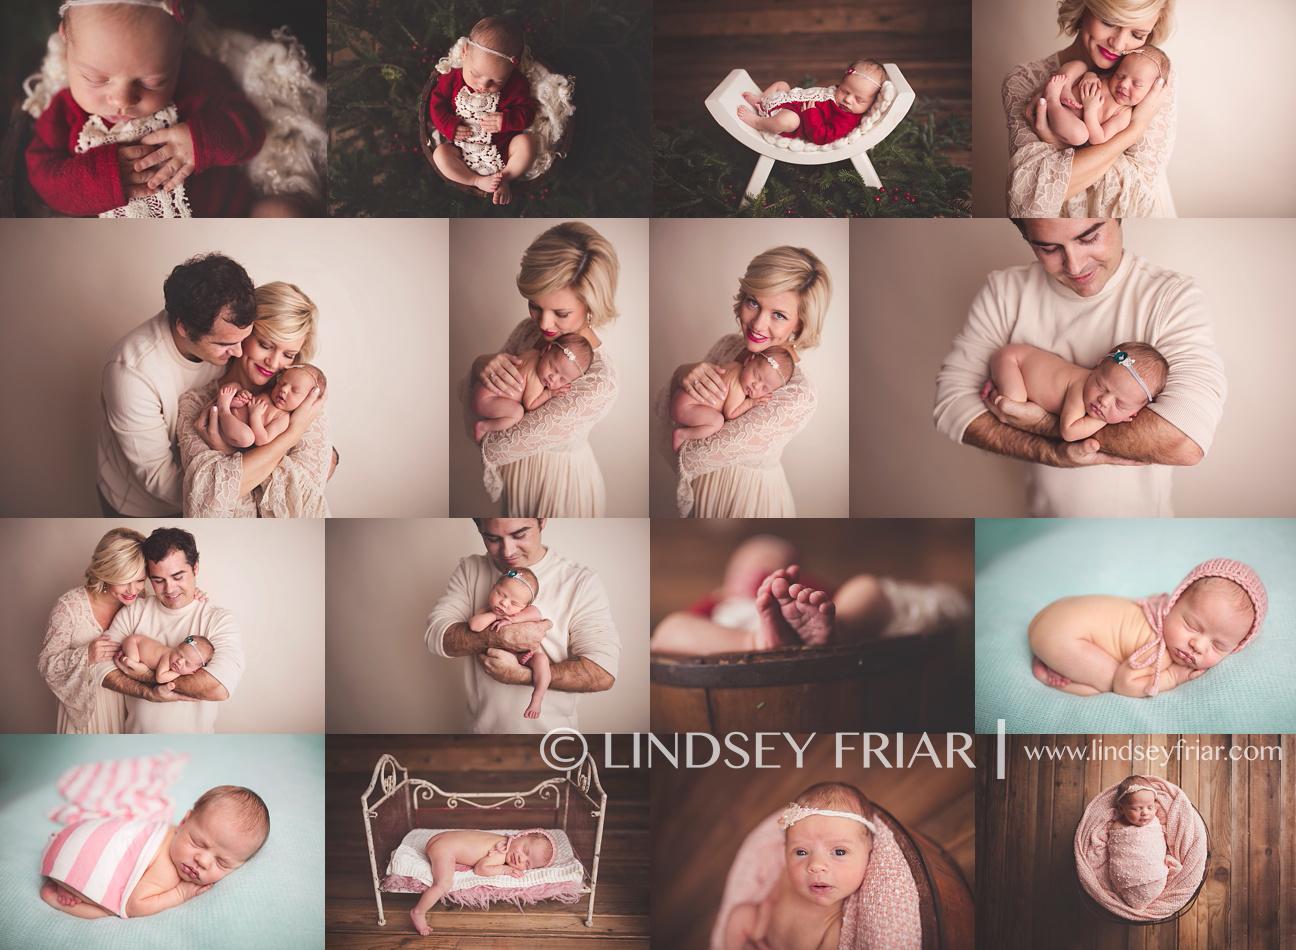 004-©-Lindsey-Friar-Photography-2015-copy